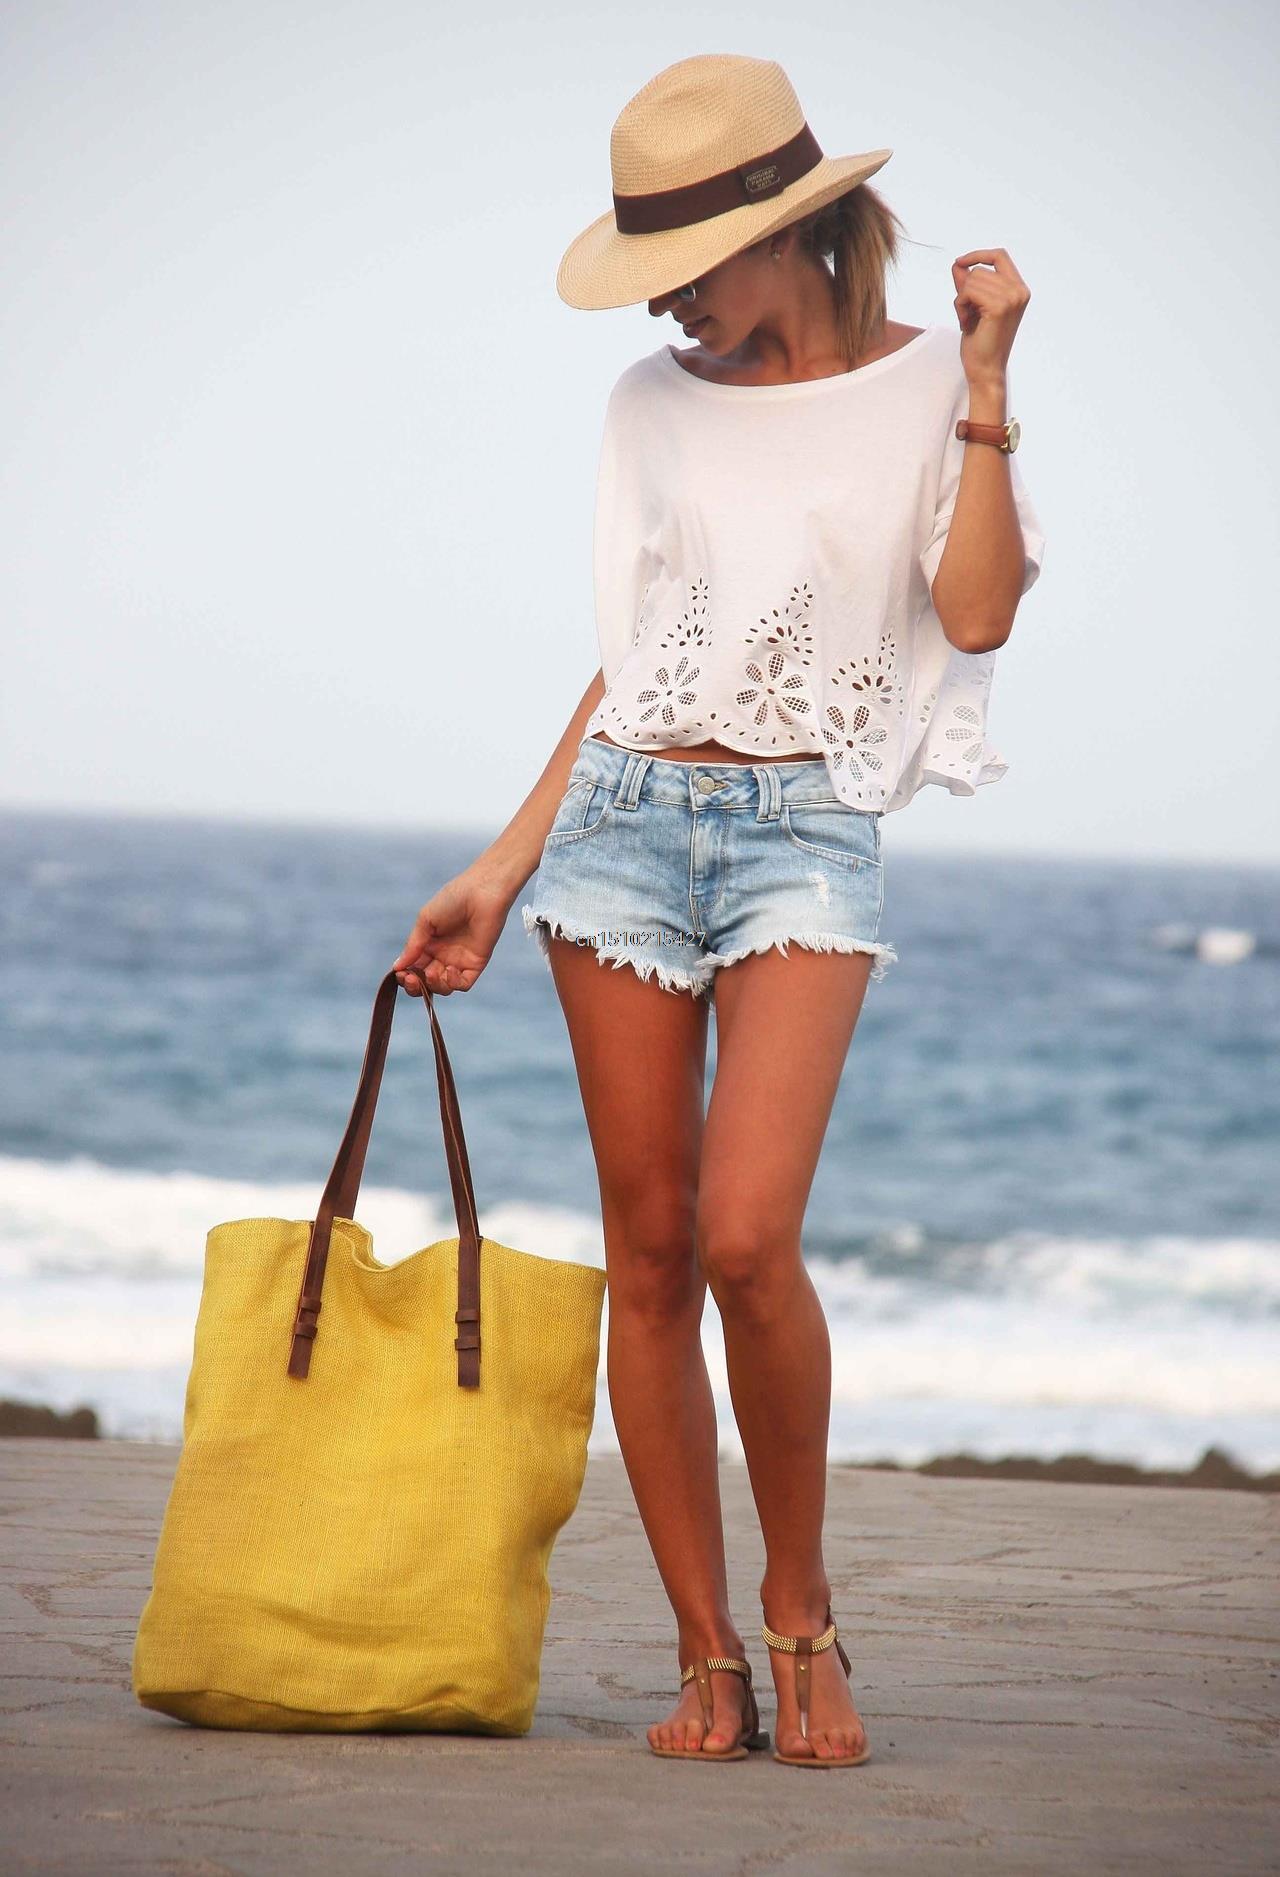 Cute Outfit Ideas For The Beach